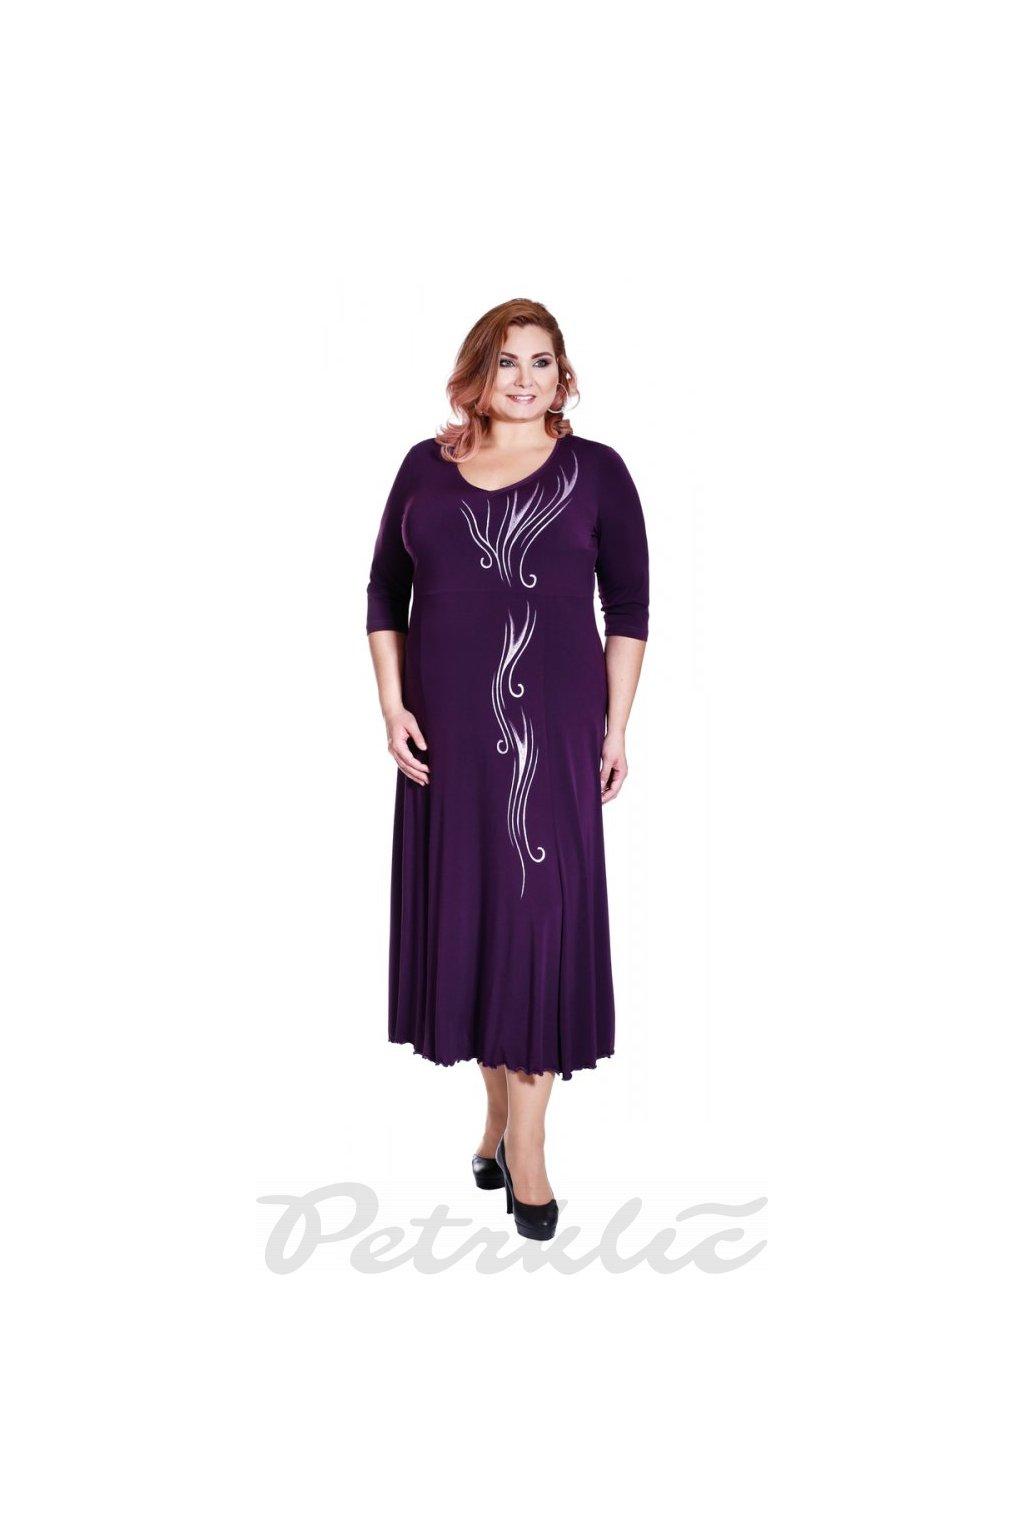 MÁJA - šaty s 3/4 rukávem 130 - 135 cm